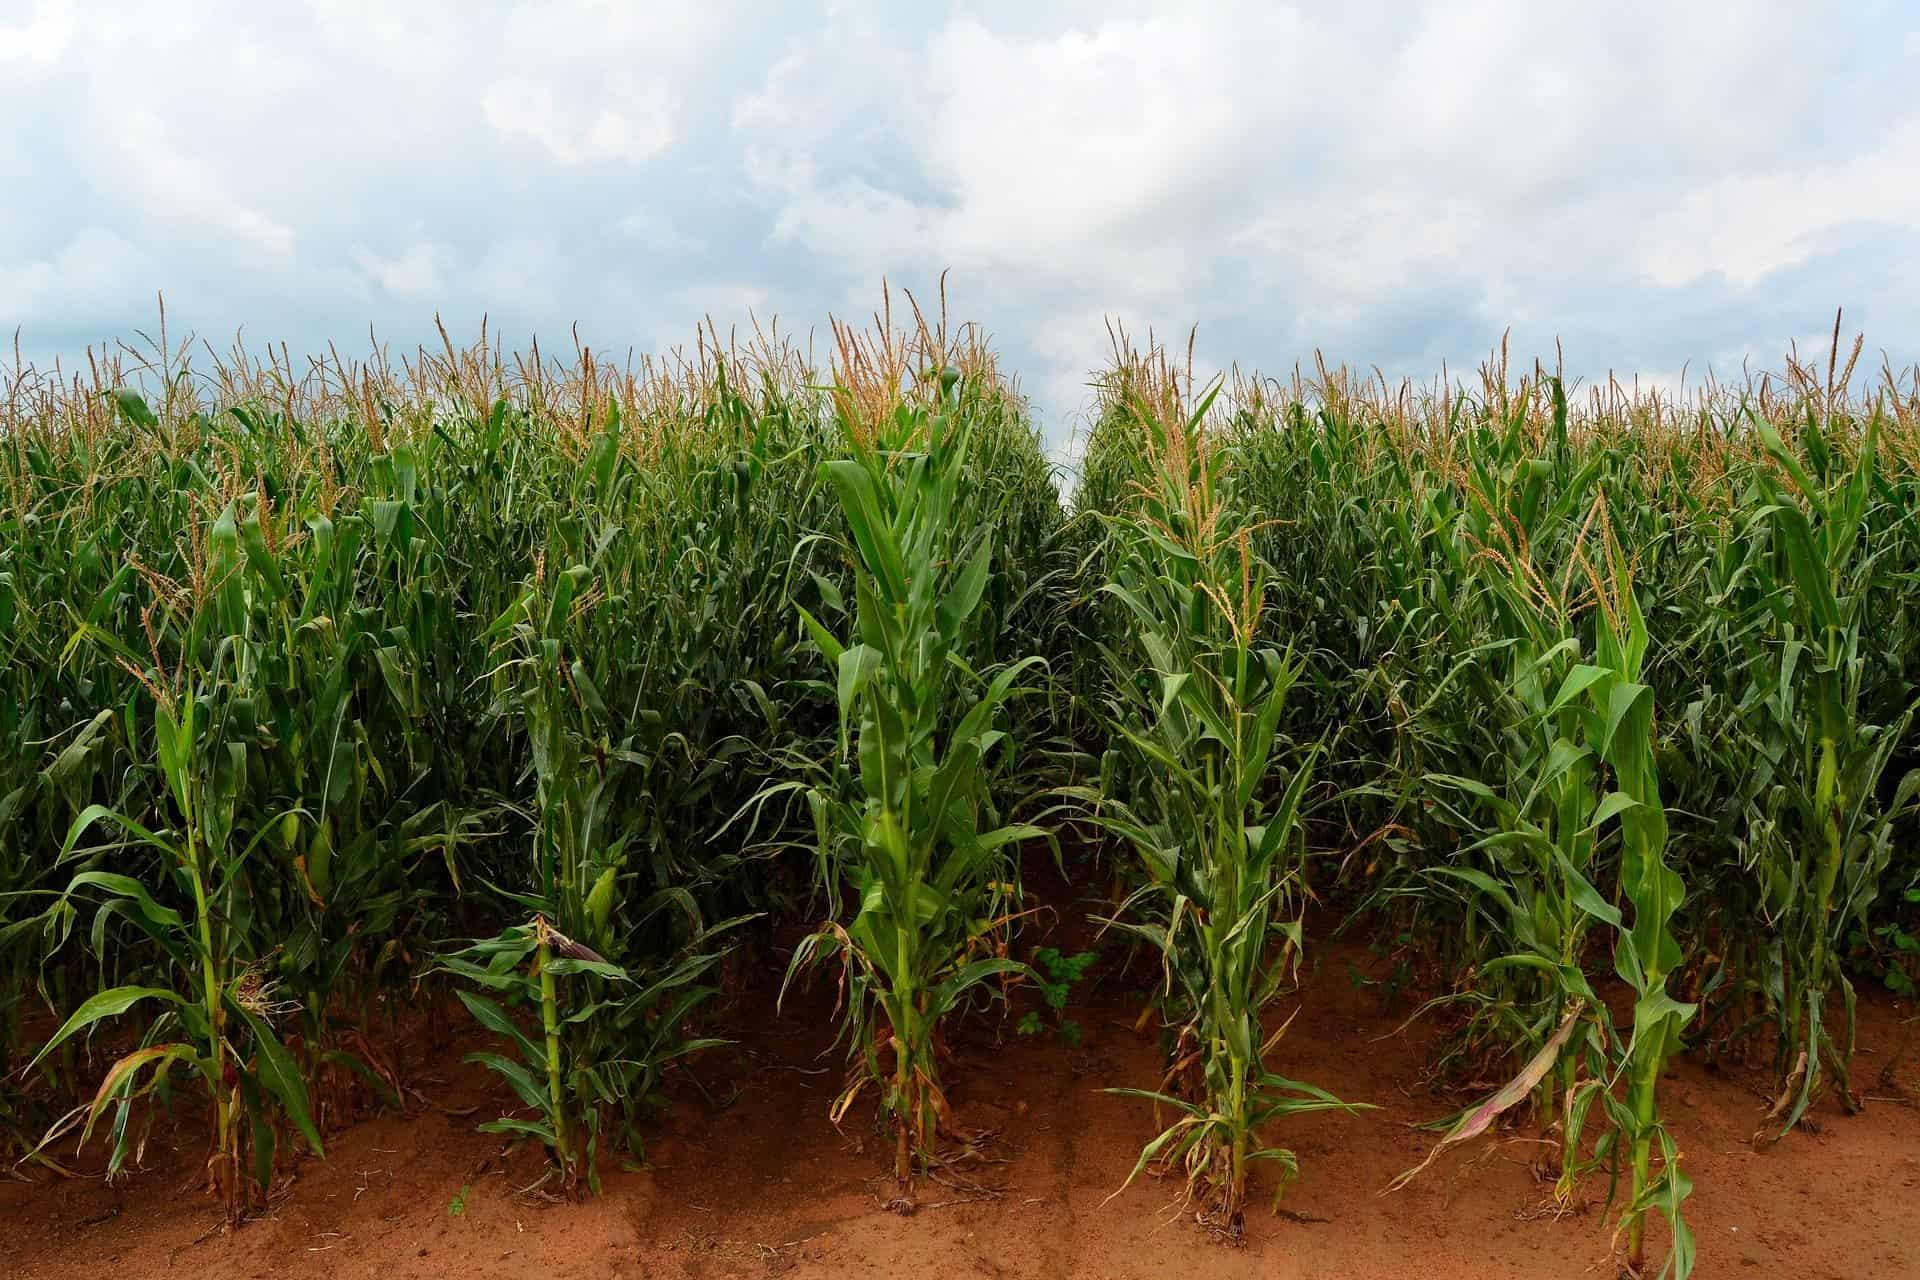 Corn grown in rows